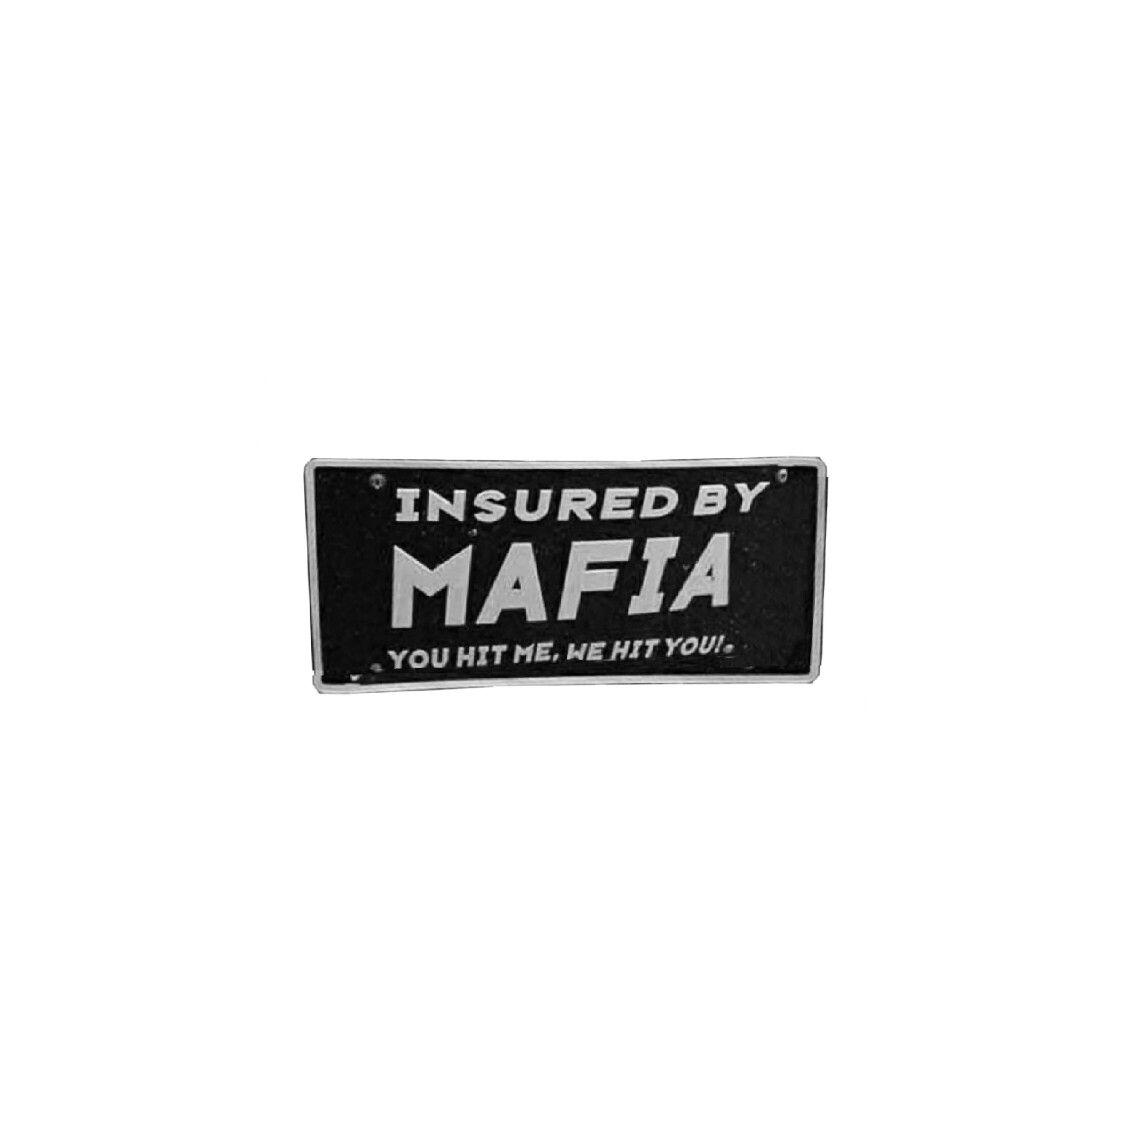 Saepe Creat Molles Aspera Spina Rosas Pinterest Ninelikethenumber Mafia Character Aesthetic Aesthetic